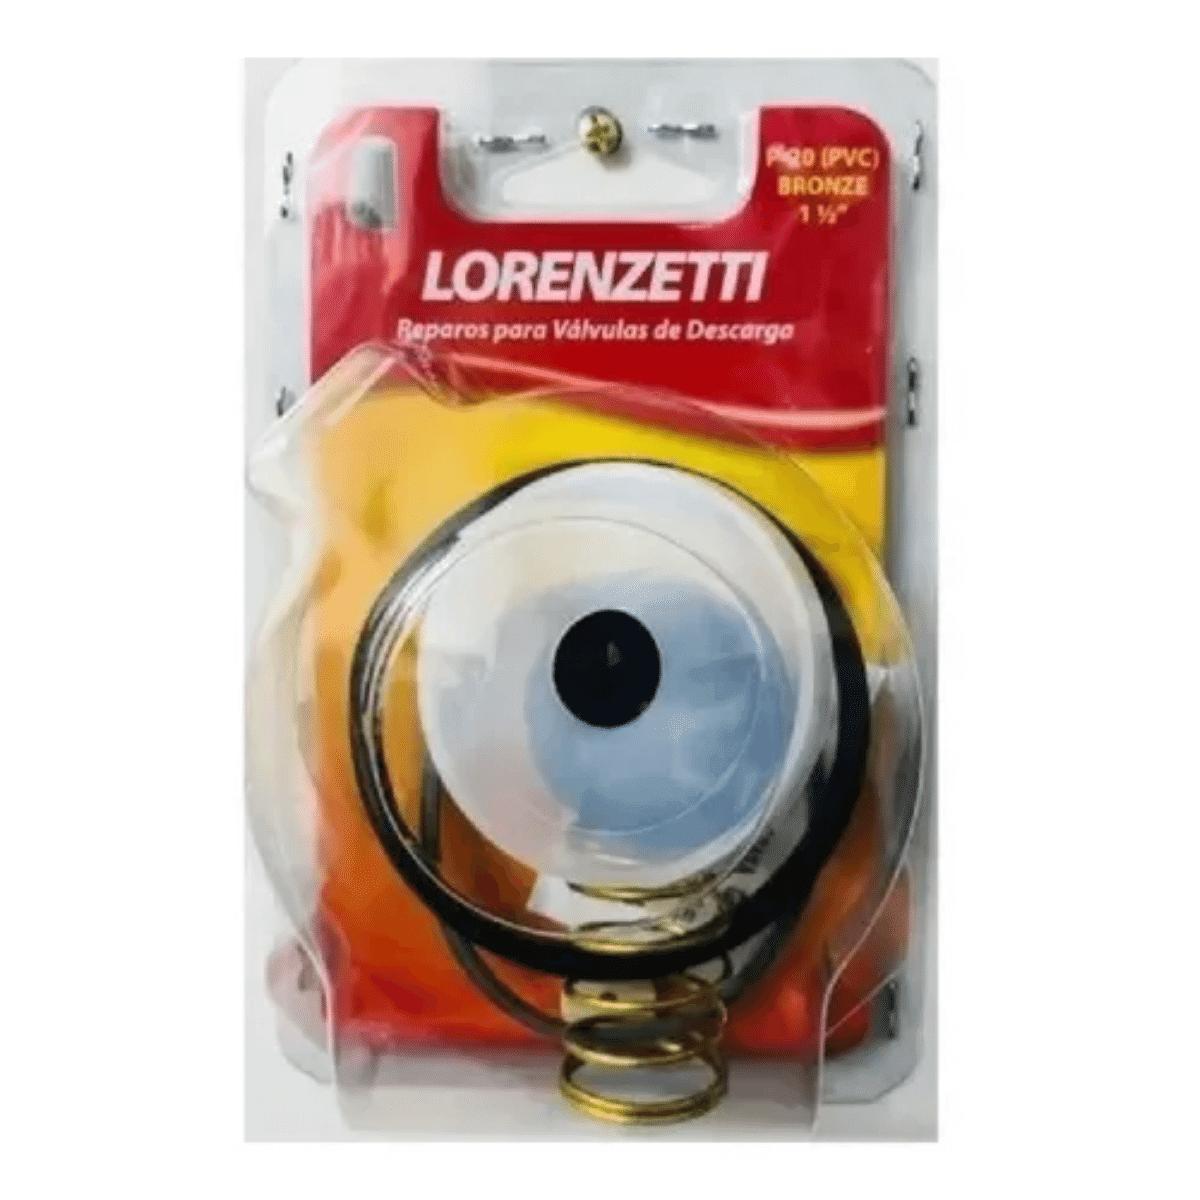 Reparo P/ Valvula Descarga  P20 Original 1.1/2 Pvc Lorenzetti